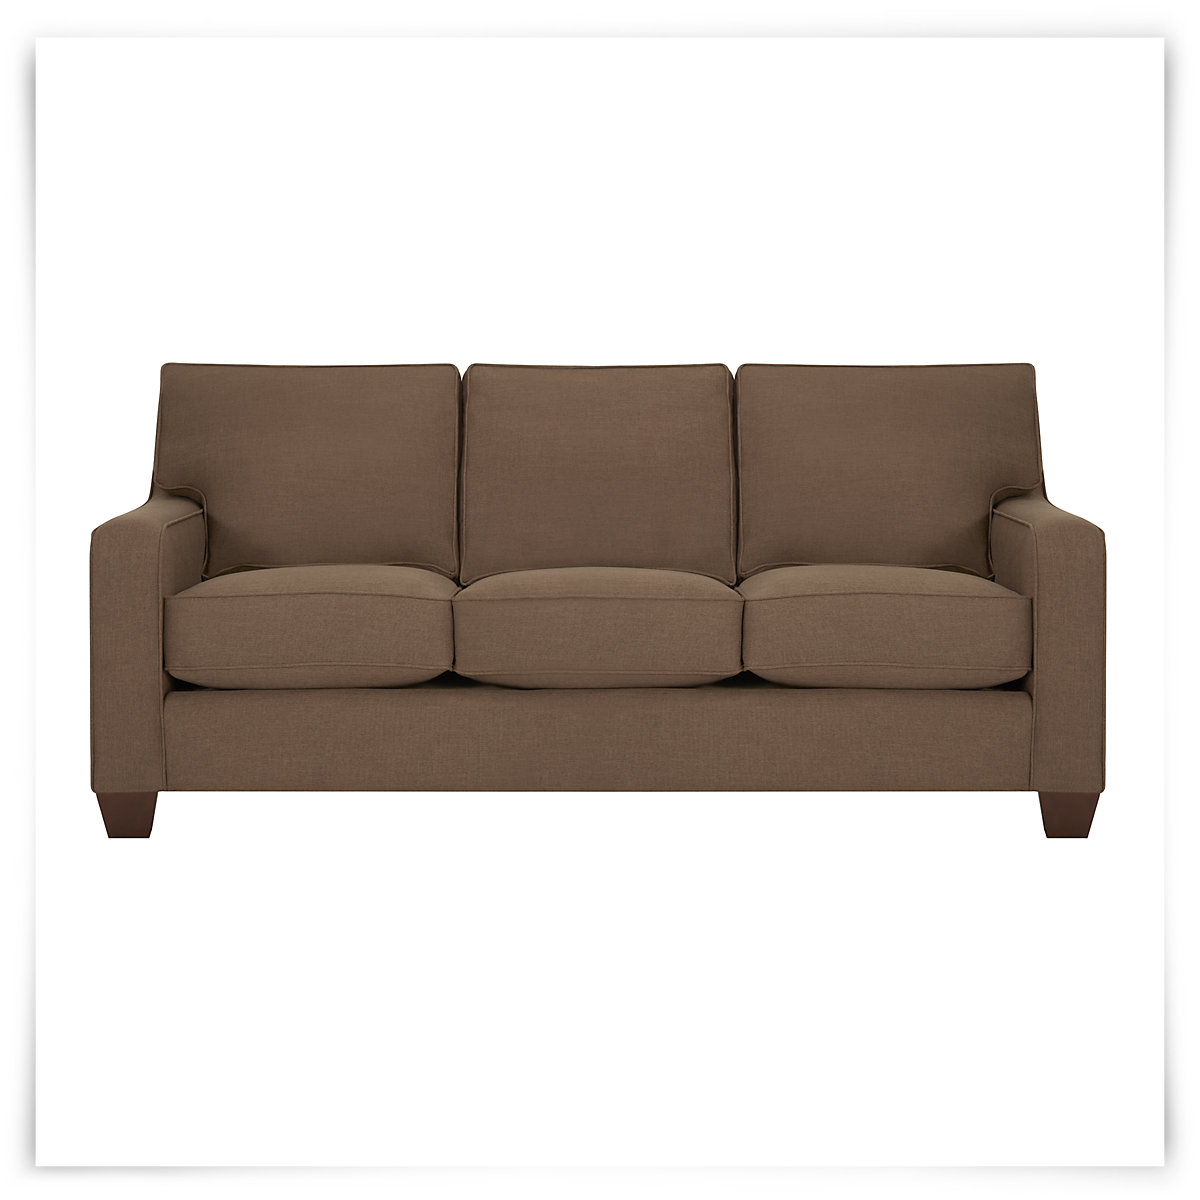 City Furniture York Dk Brown Fabric Memory Foam Sleeper